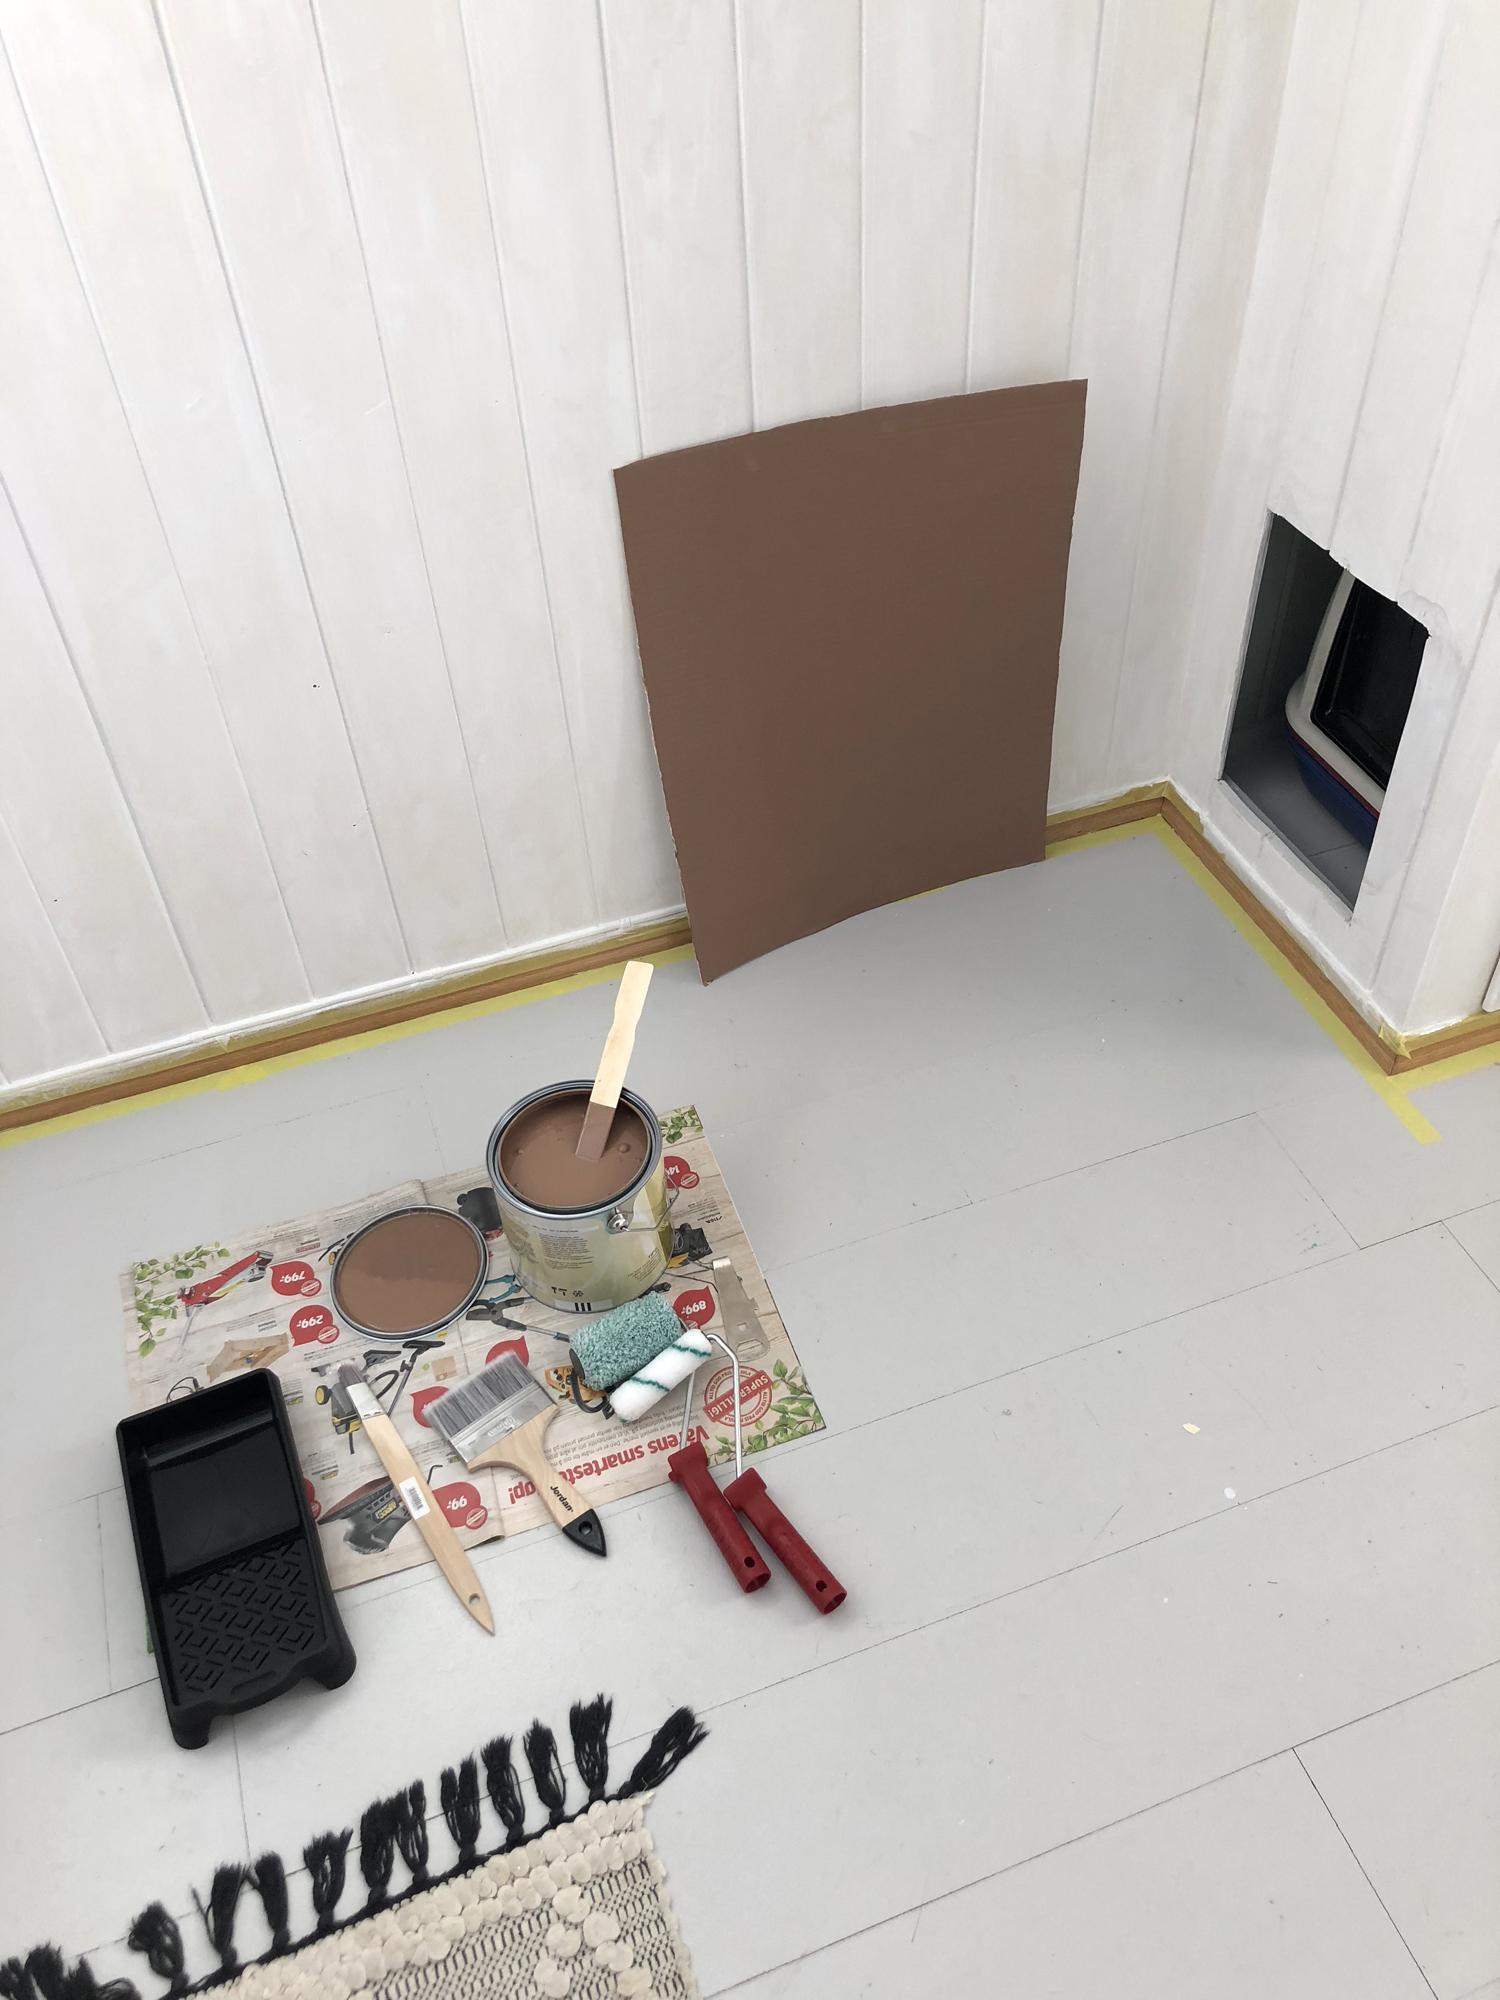 maling i gangen kreativitetblogg